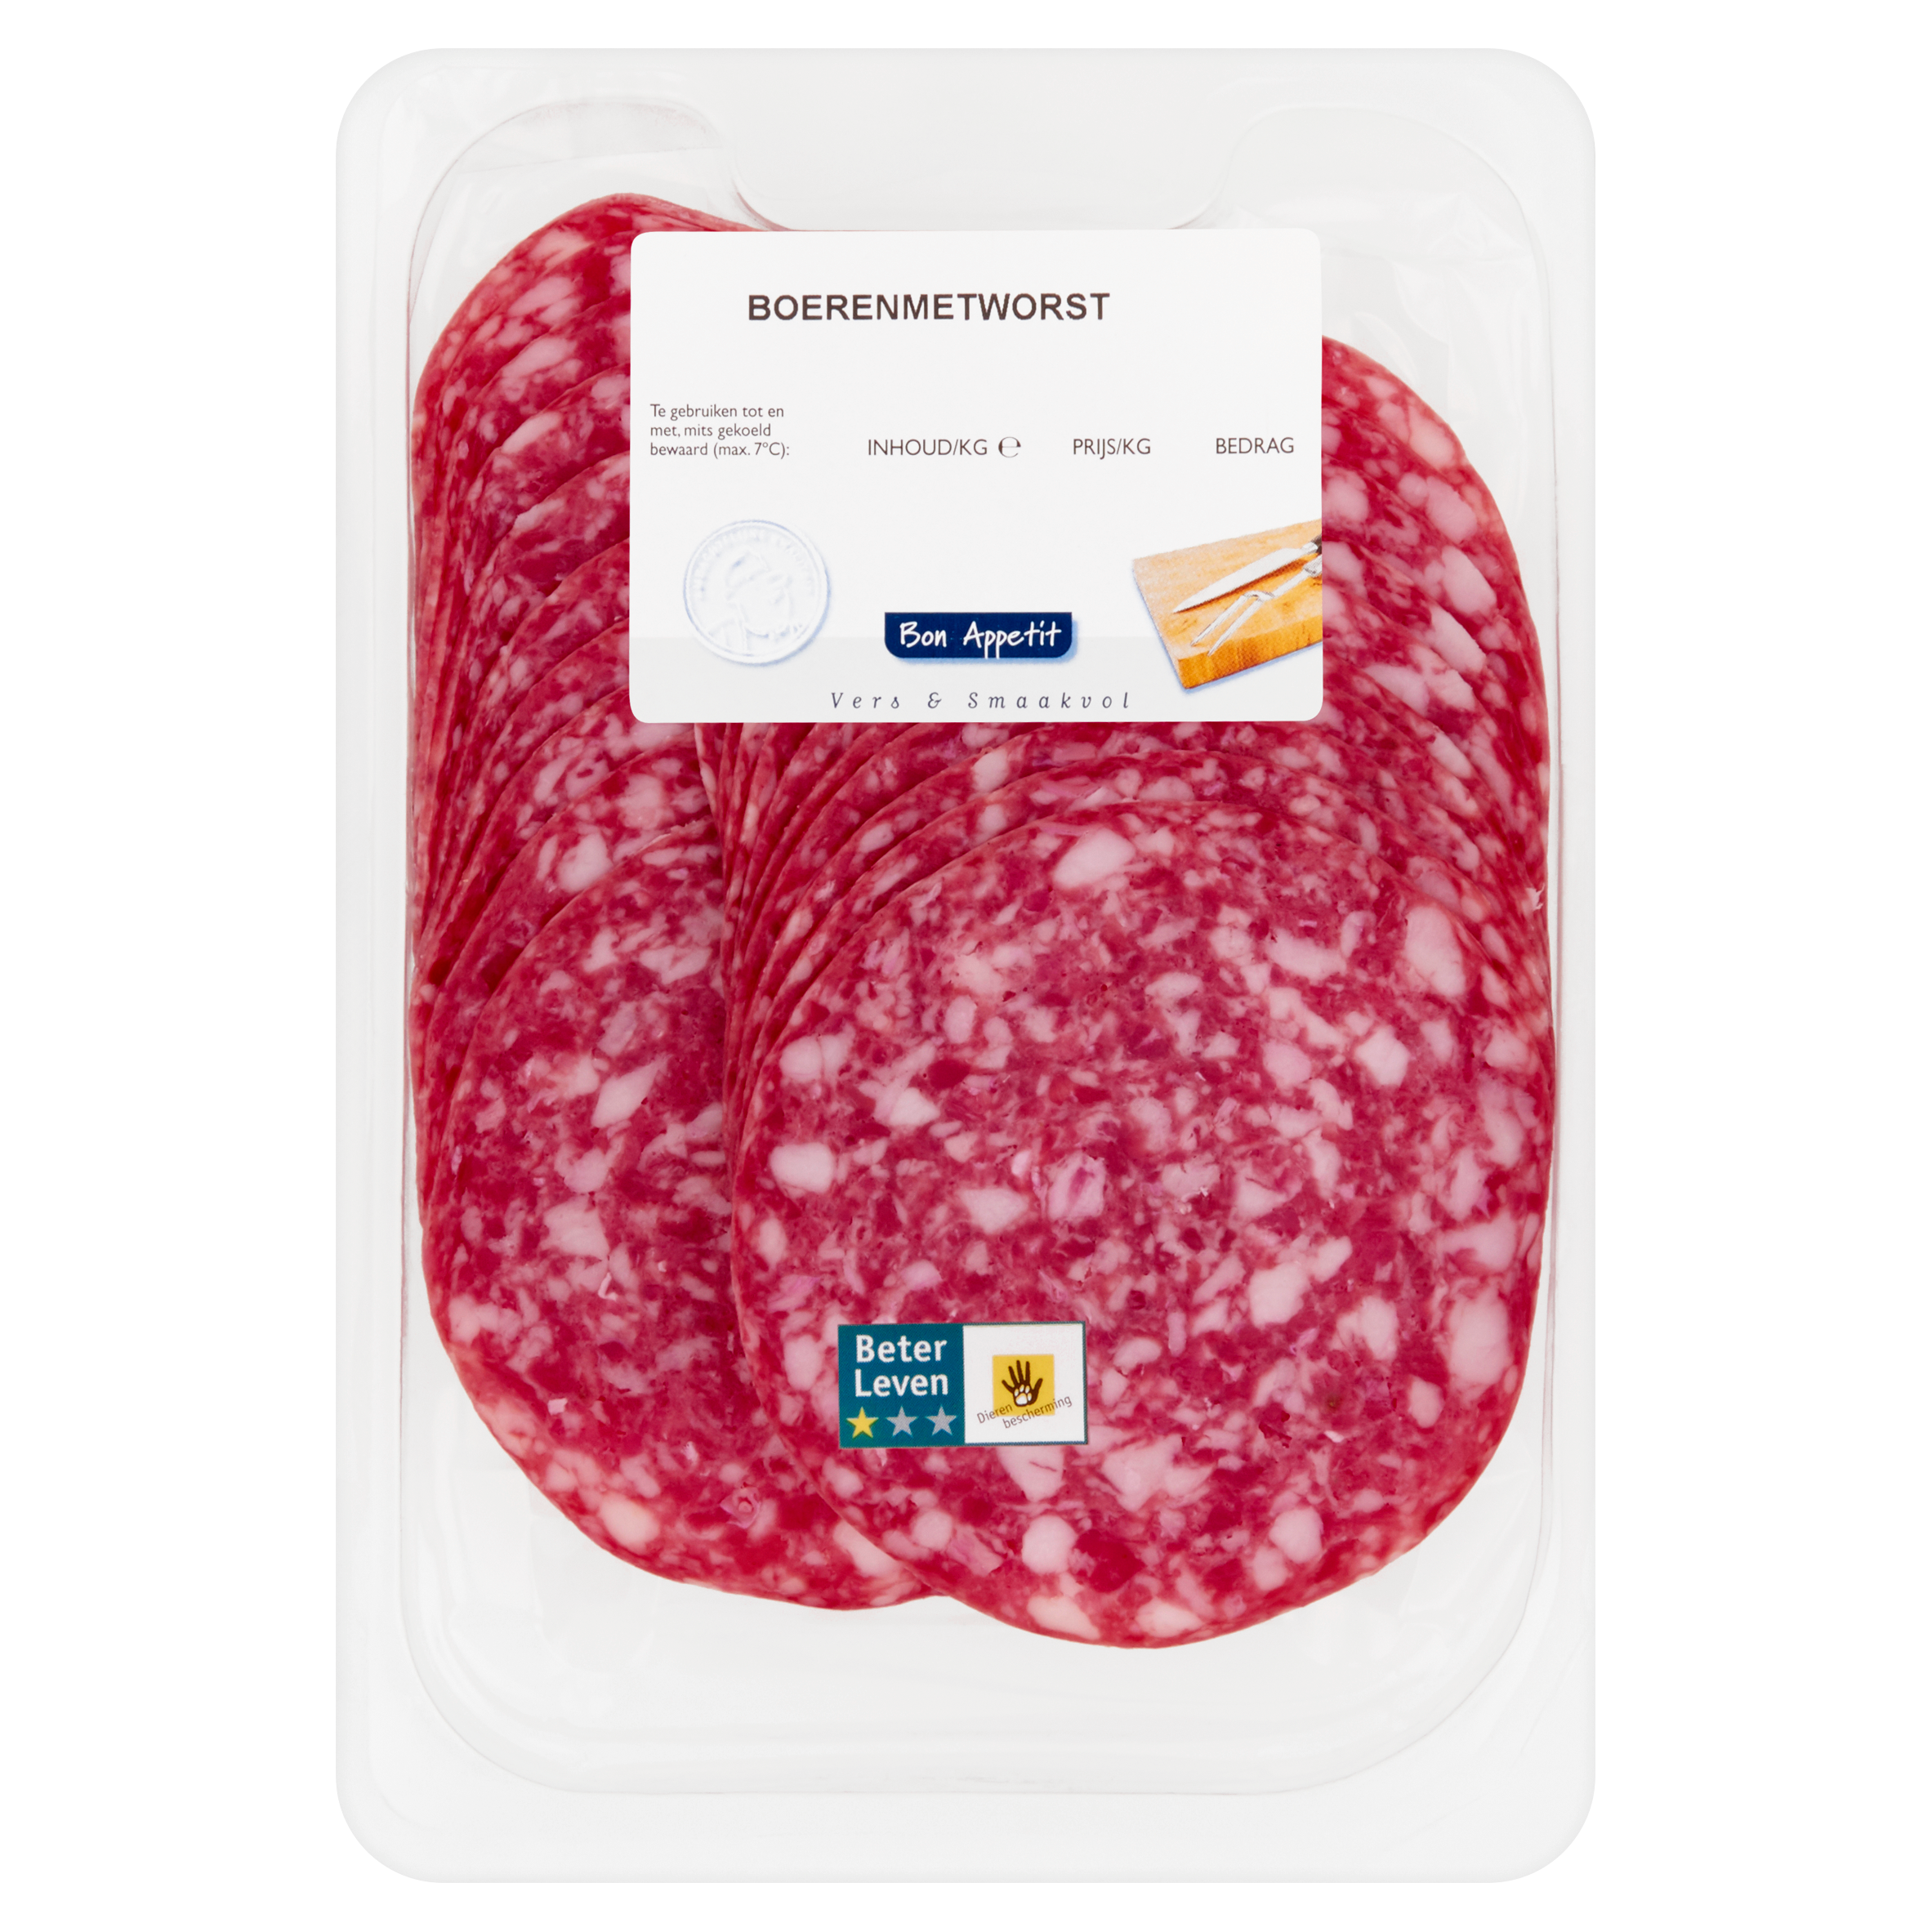 Bon Appetit Boerenmetworst 0,150 kg